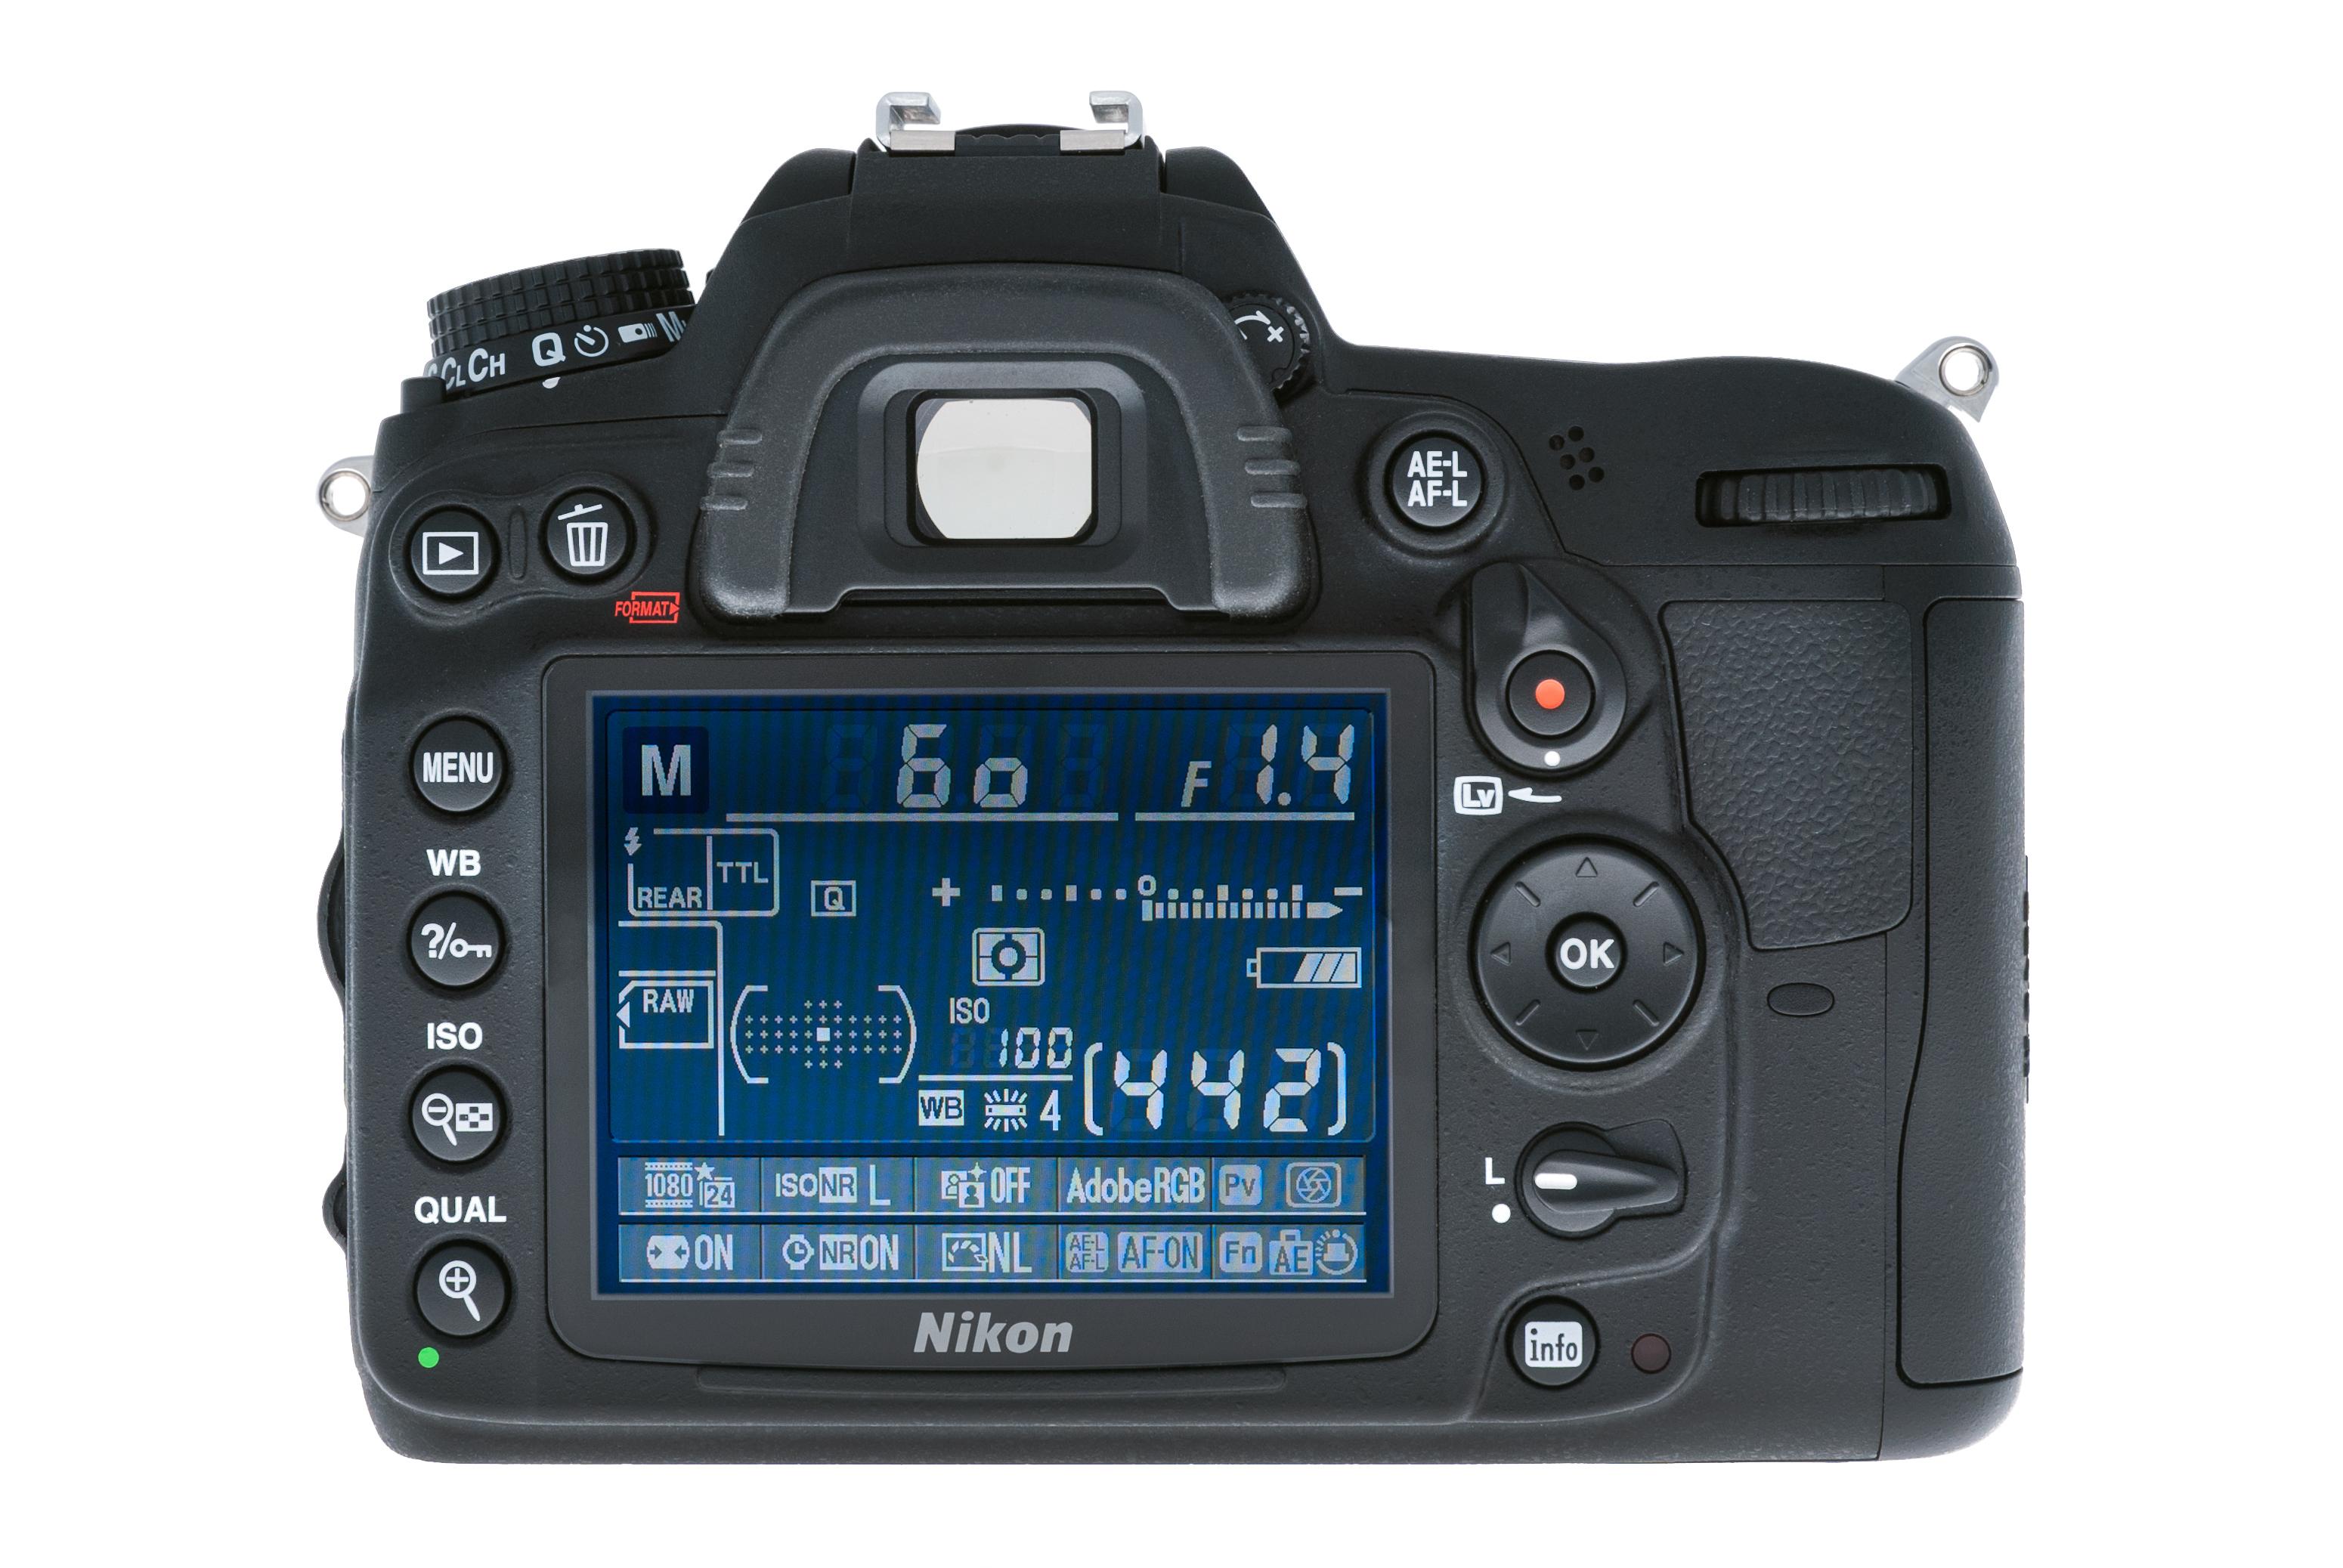 Camera Dslr Slr Camera filenikon d7000 digital slr camera 01 jpg wikimedia commons jpg